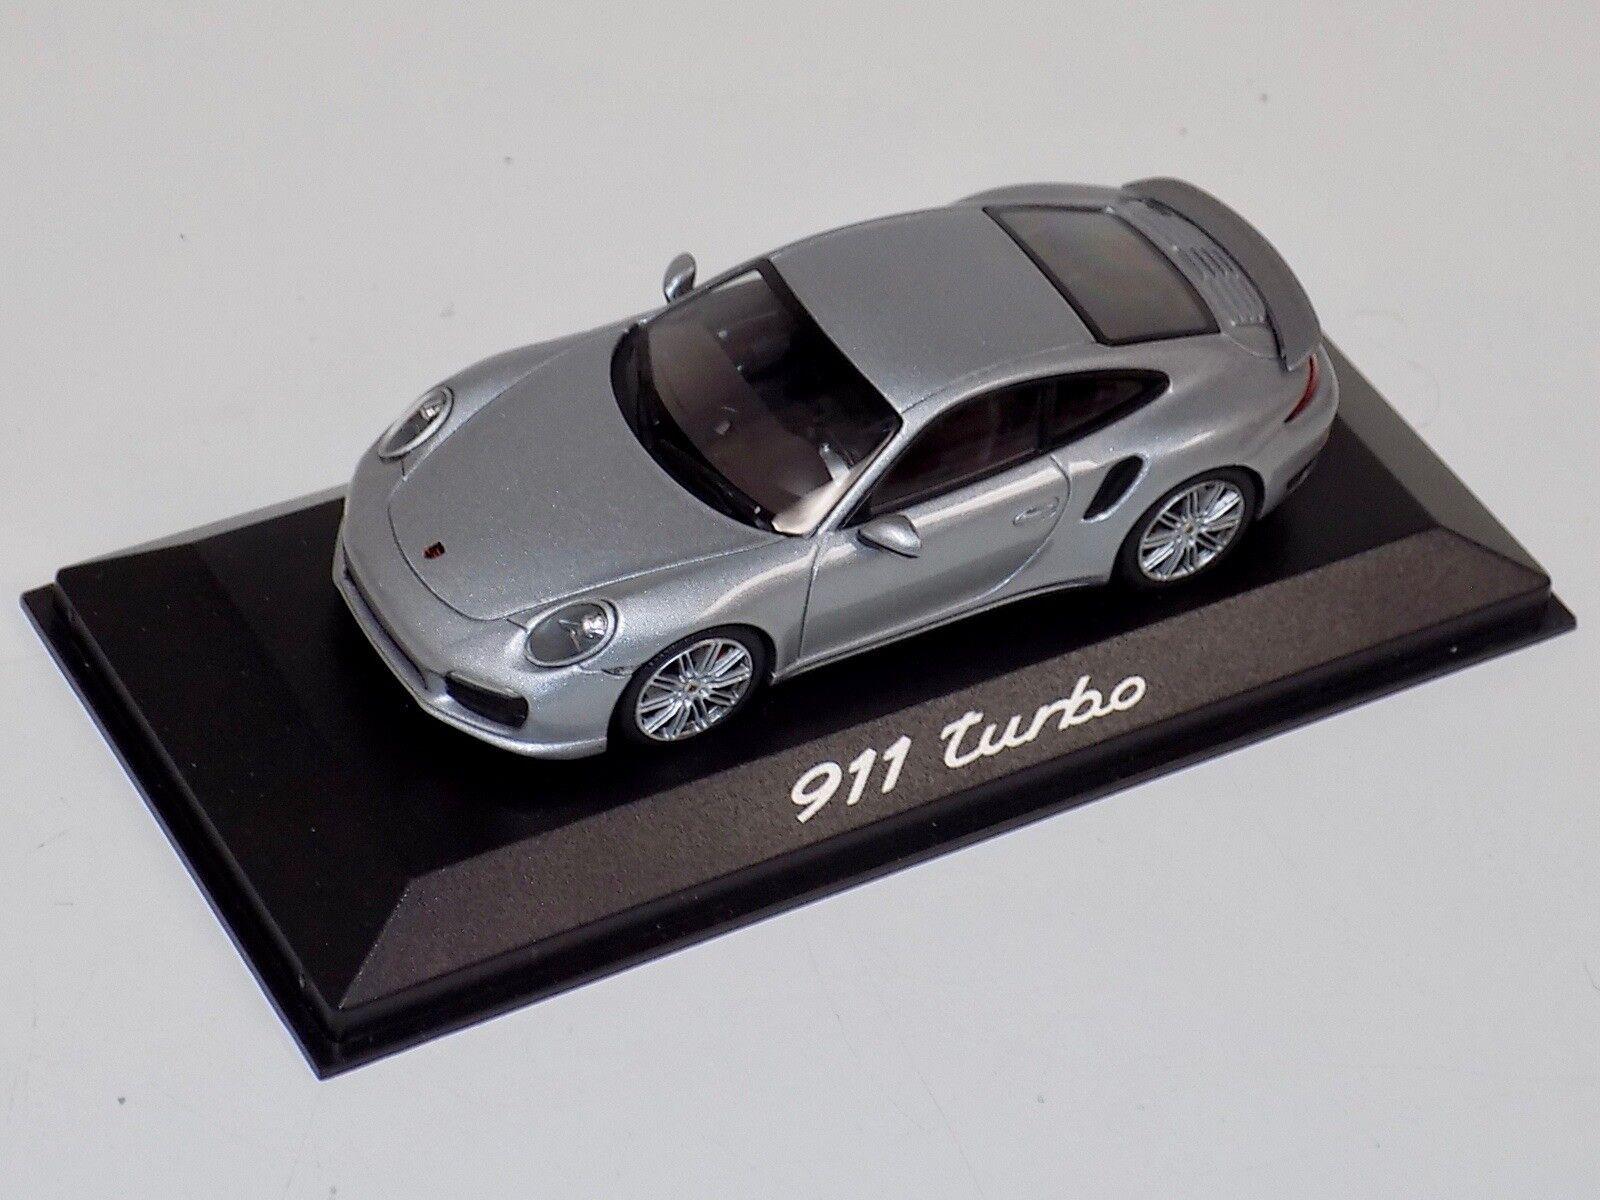 1/43 Minichamps PORSCHE 911 Turbo plata de Porsche Turbo Set 2